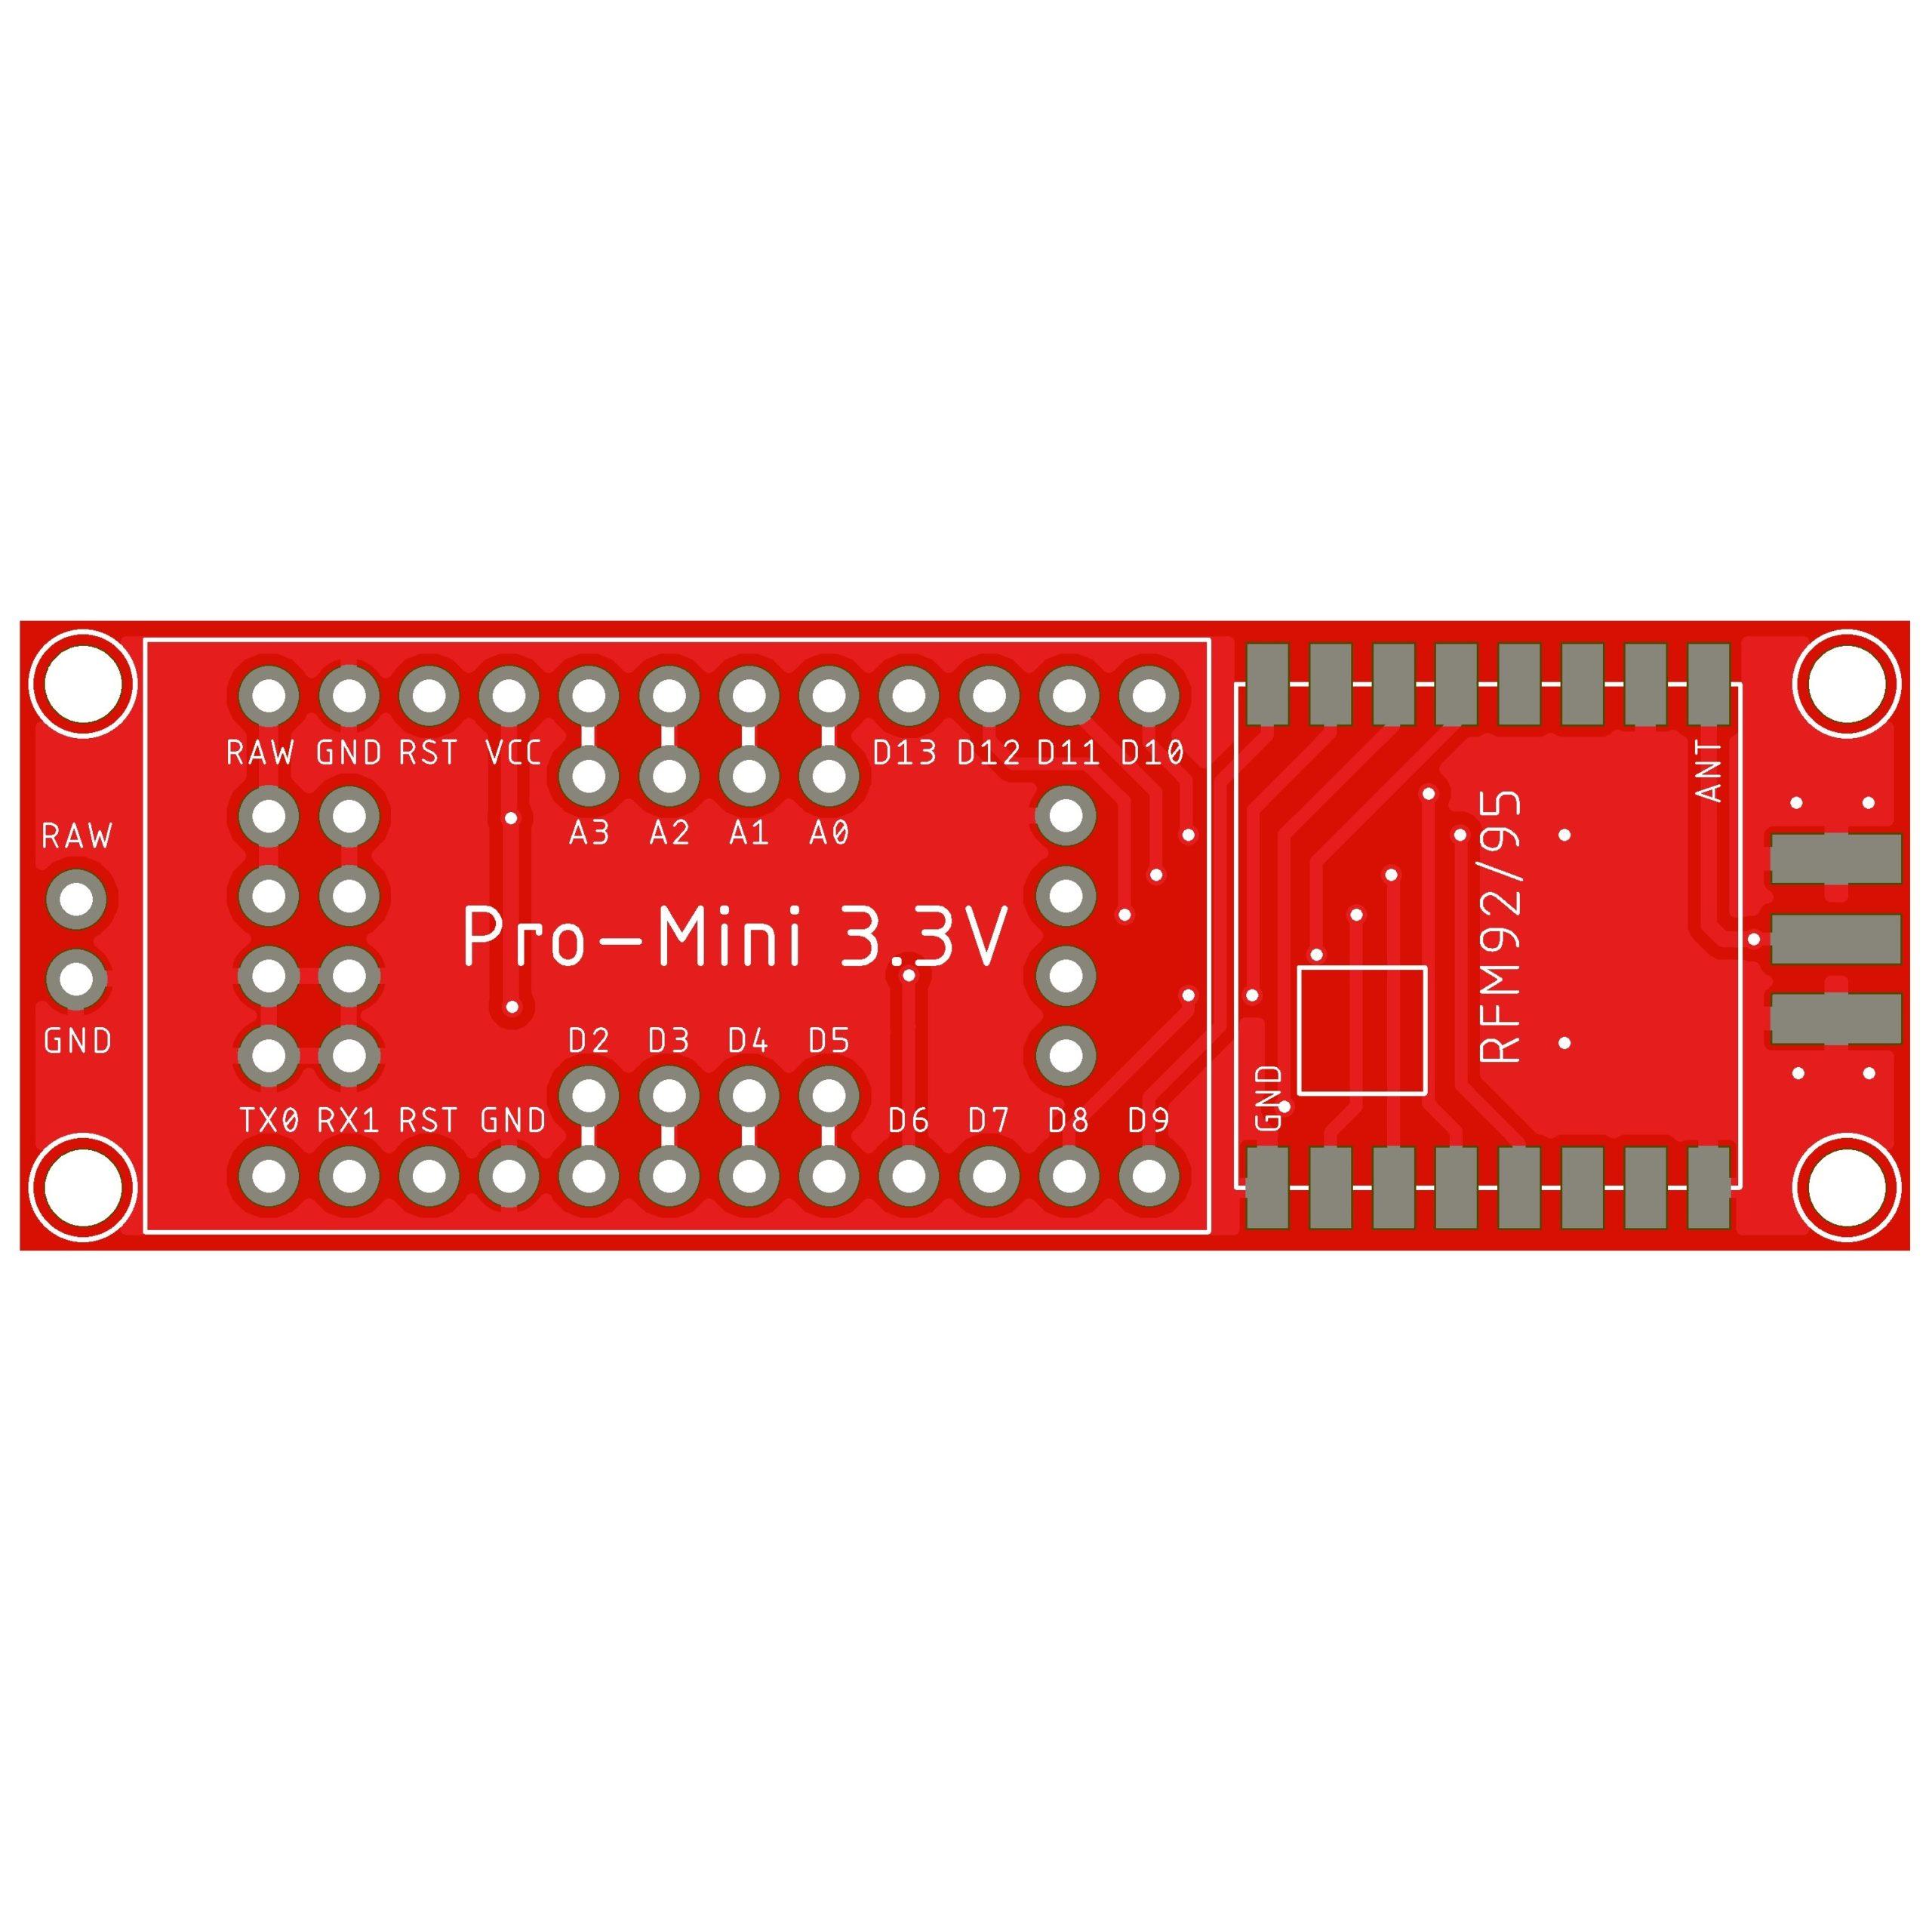 LoRa Node PCB 203 for Interface Pro Mini RFM92RFM95